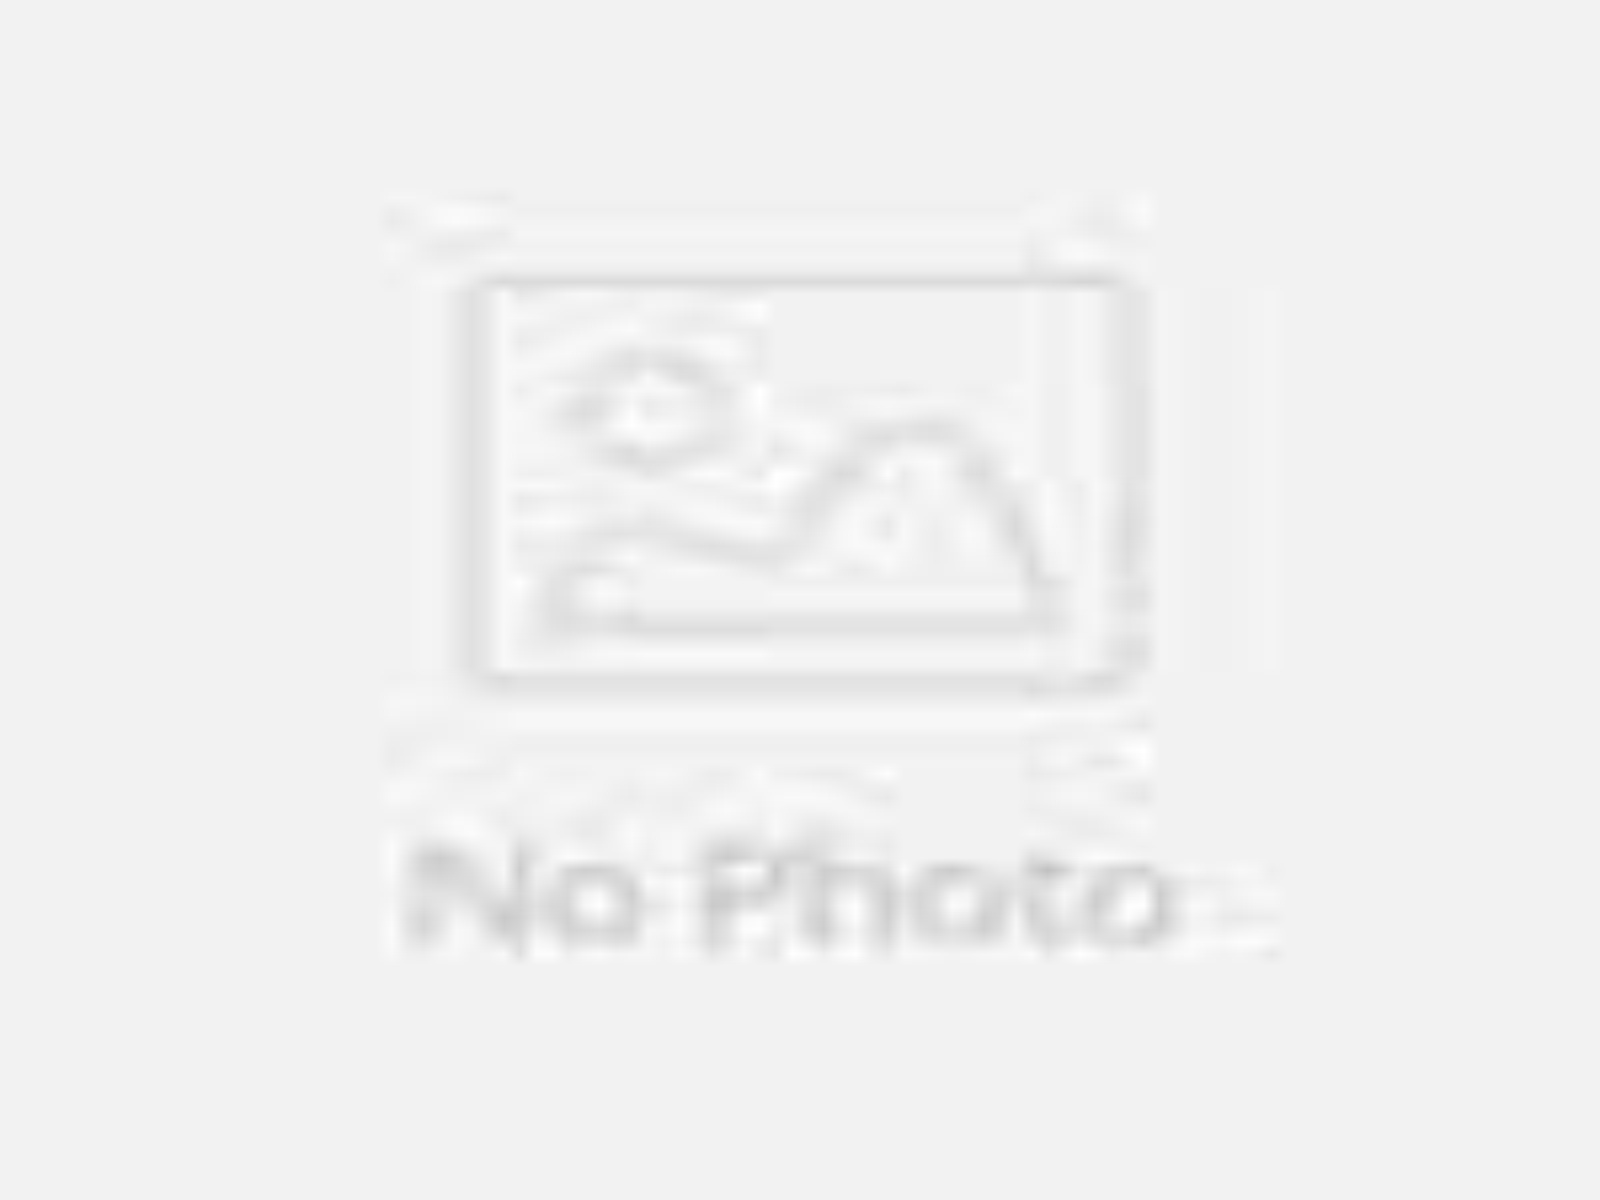 Food Grade High Sealed Pet Jar Buy Food Grade High